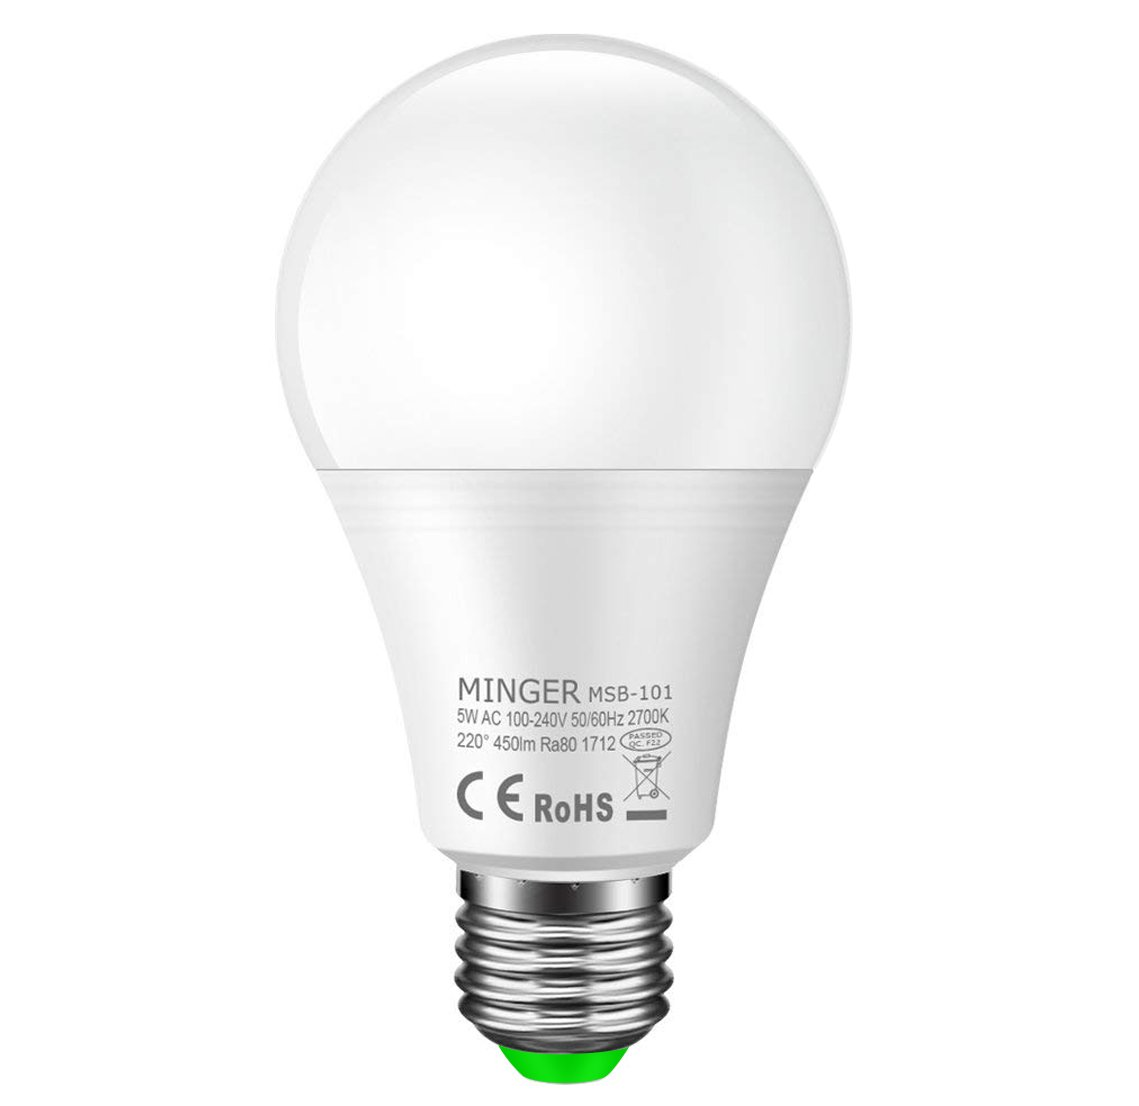 Minger LED電球 搭載レーダー探知機 E26/E27口金 40W形相当 電球色 明暗&人感センサー 自動点灯 5W 一般電球・広配光タイプ